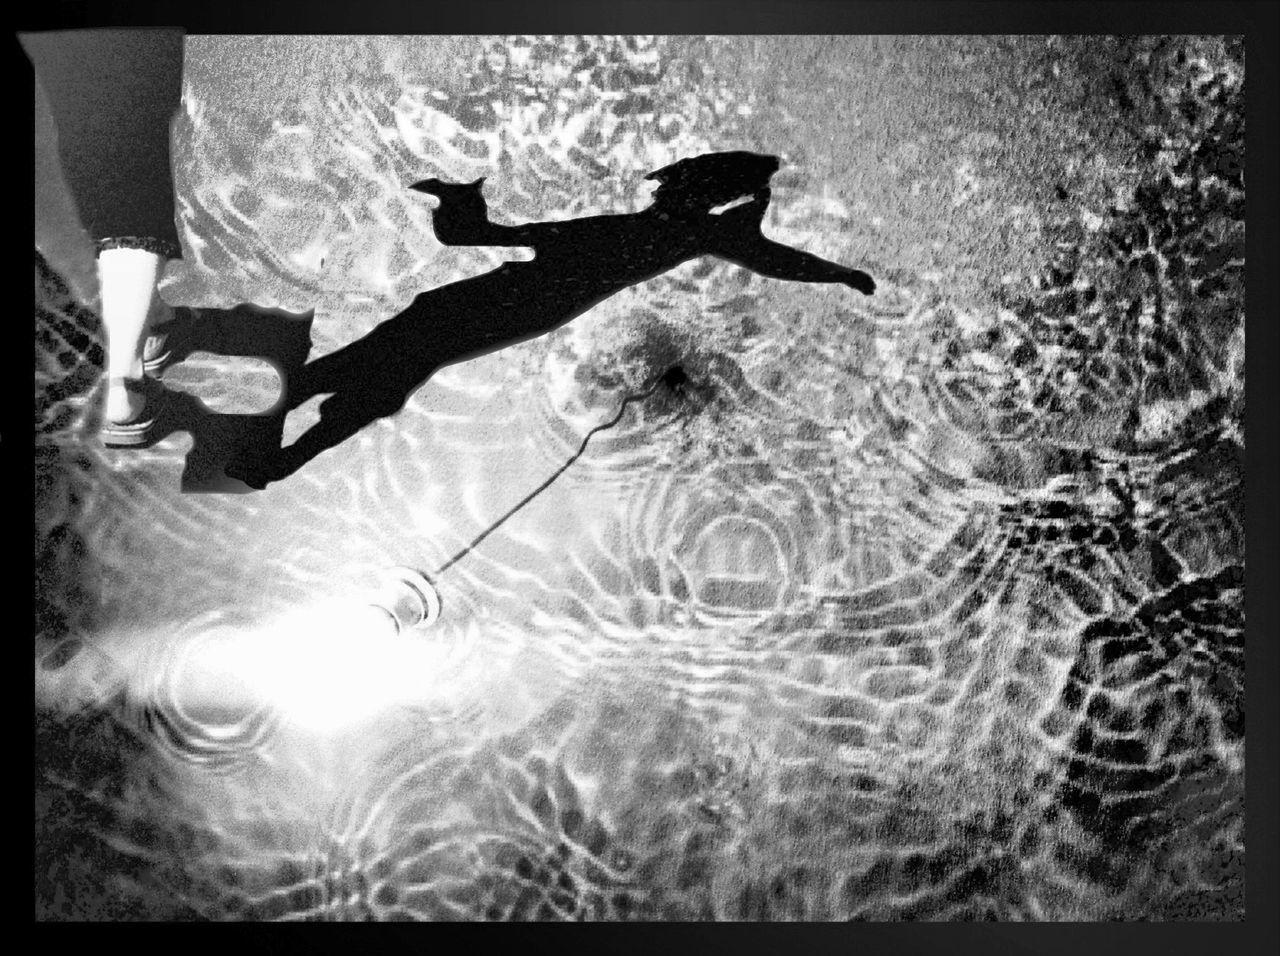 Digital Composite Woman Walking On Water